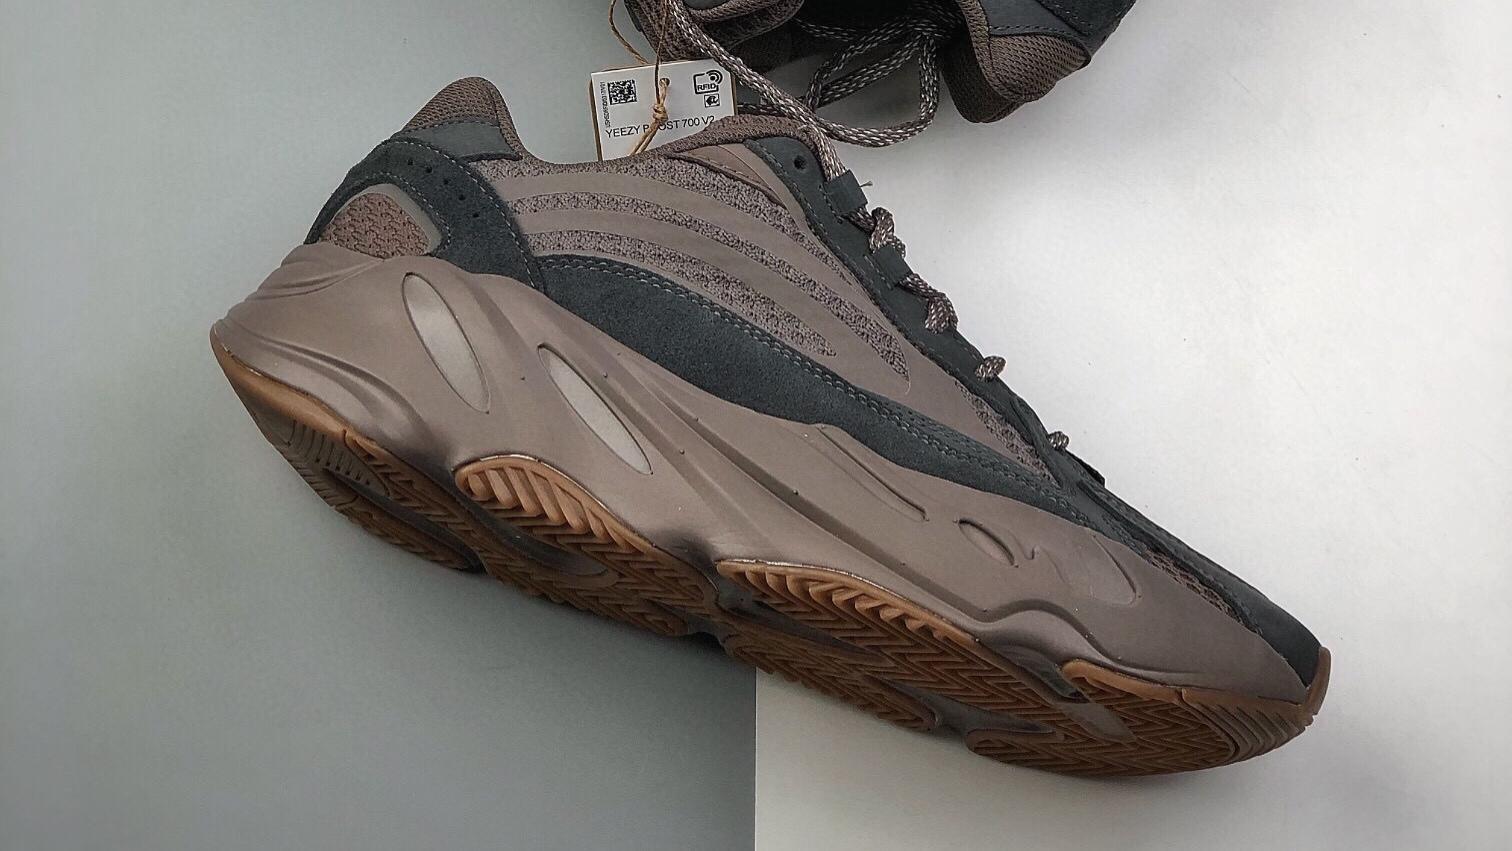 阿迪达斯 椰子700 adidas originals Yeezy Boost 700